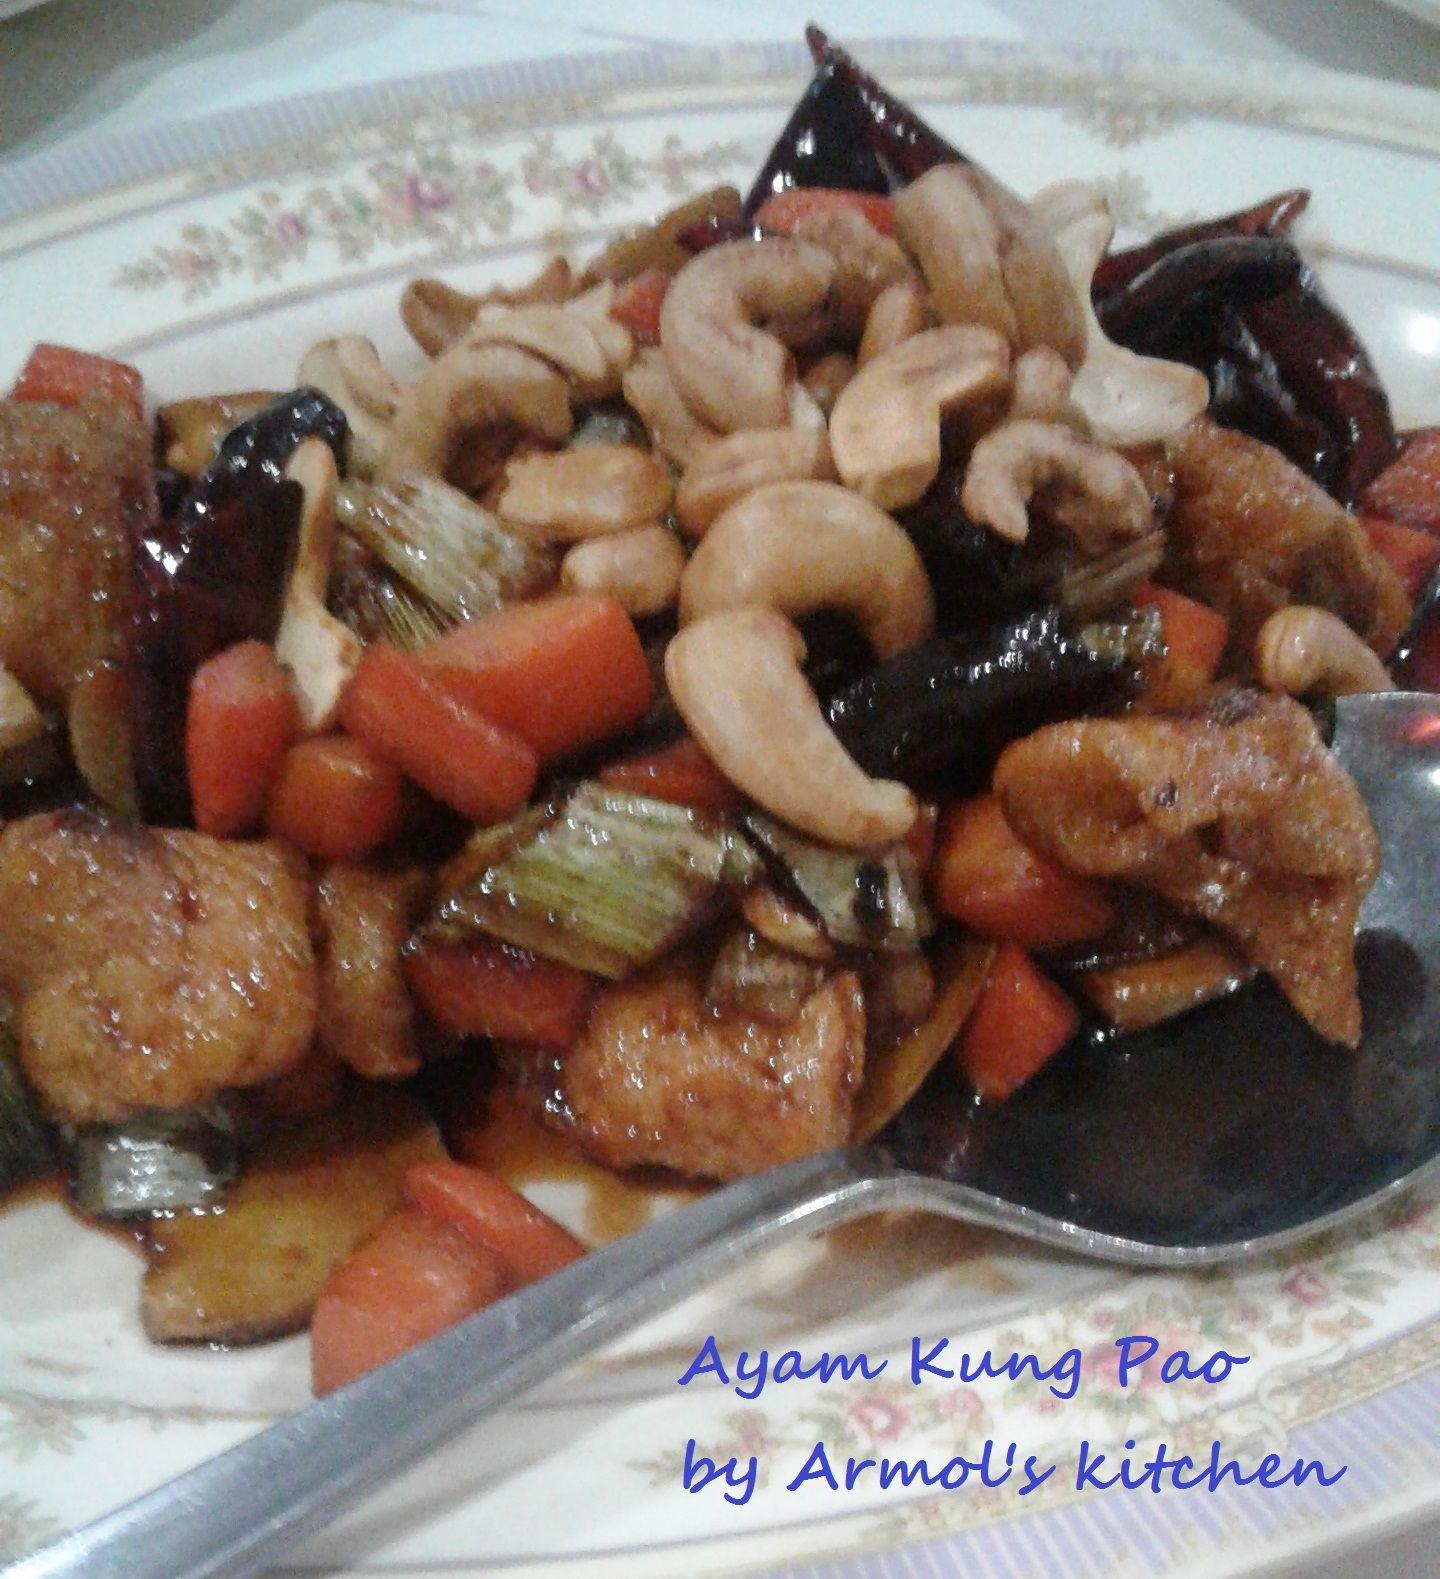 Ayam Kung Pao    Ayam dimasak dengan bumbu cina dan cabe kering    Yuk simak resepnya http://aneka-resep-masakan-online.blogspot.co.id/2016/07/resep-ayam-kung-pao.html